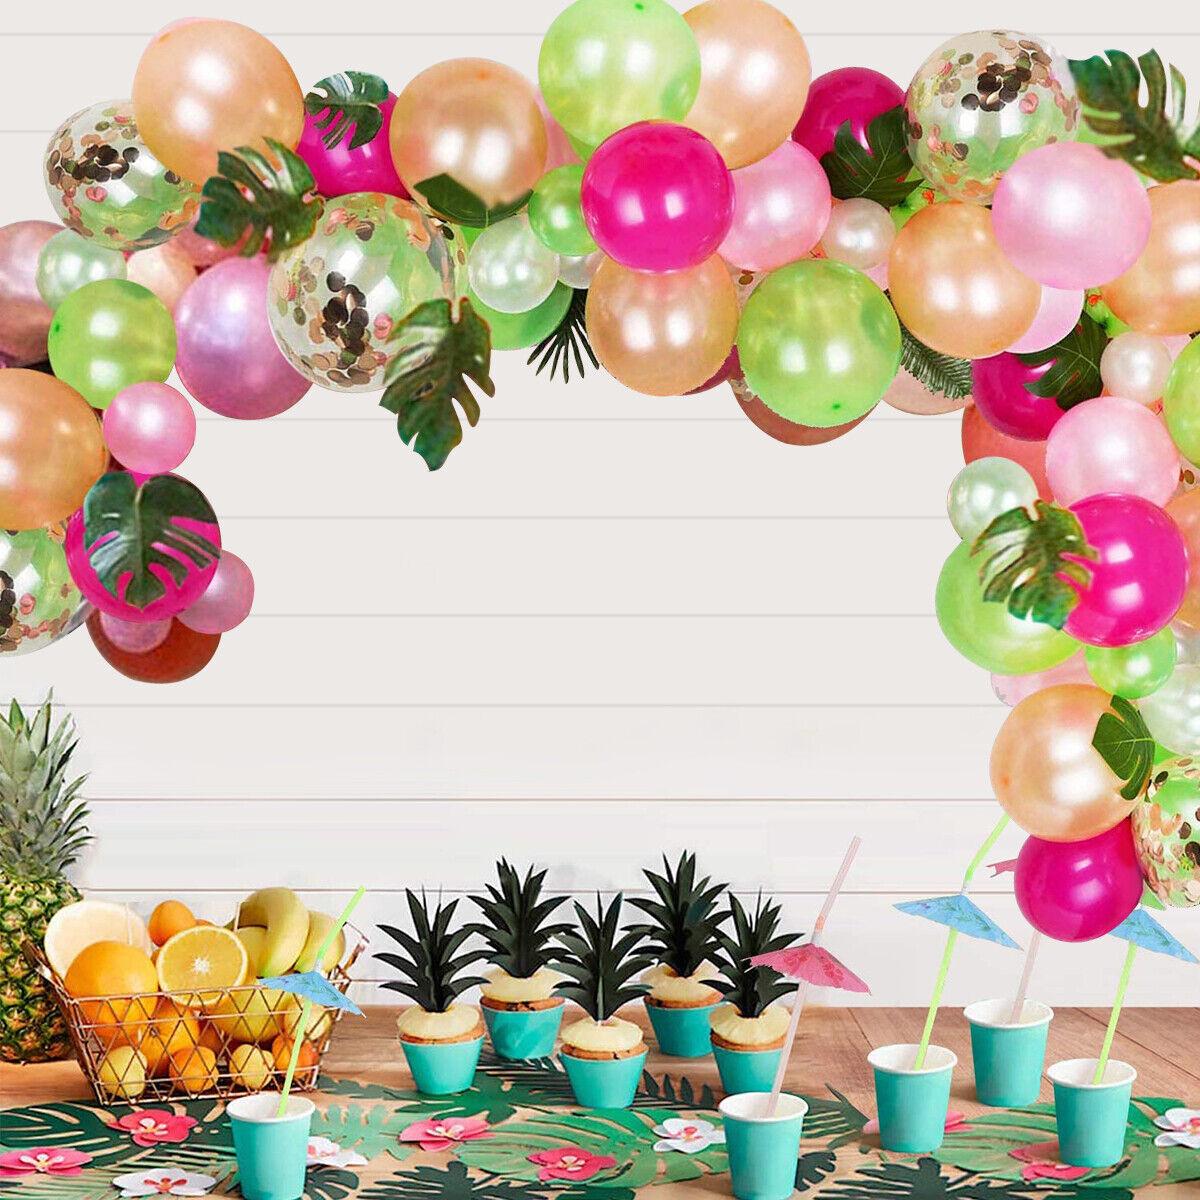 Tropical baby shower decor,Tropical table decor,Flamingo birthday,Tropical wedding,Tropical garland,Pineapple decor,for MORE PLEASE CONTACT